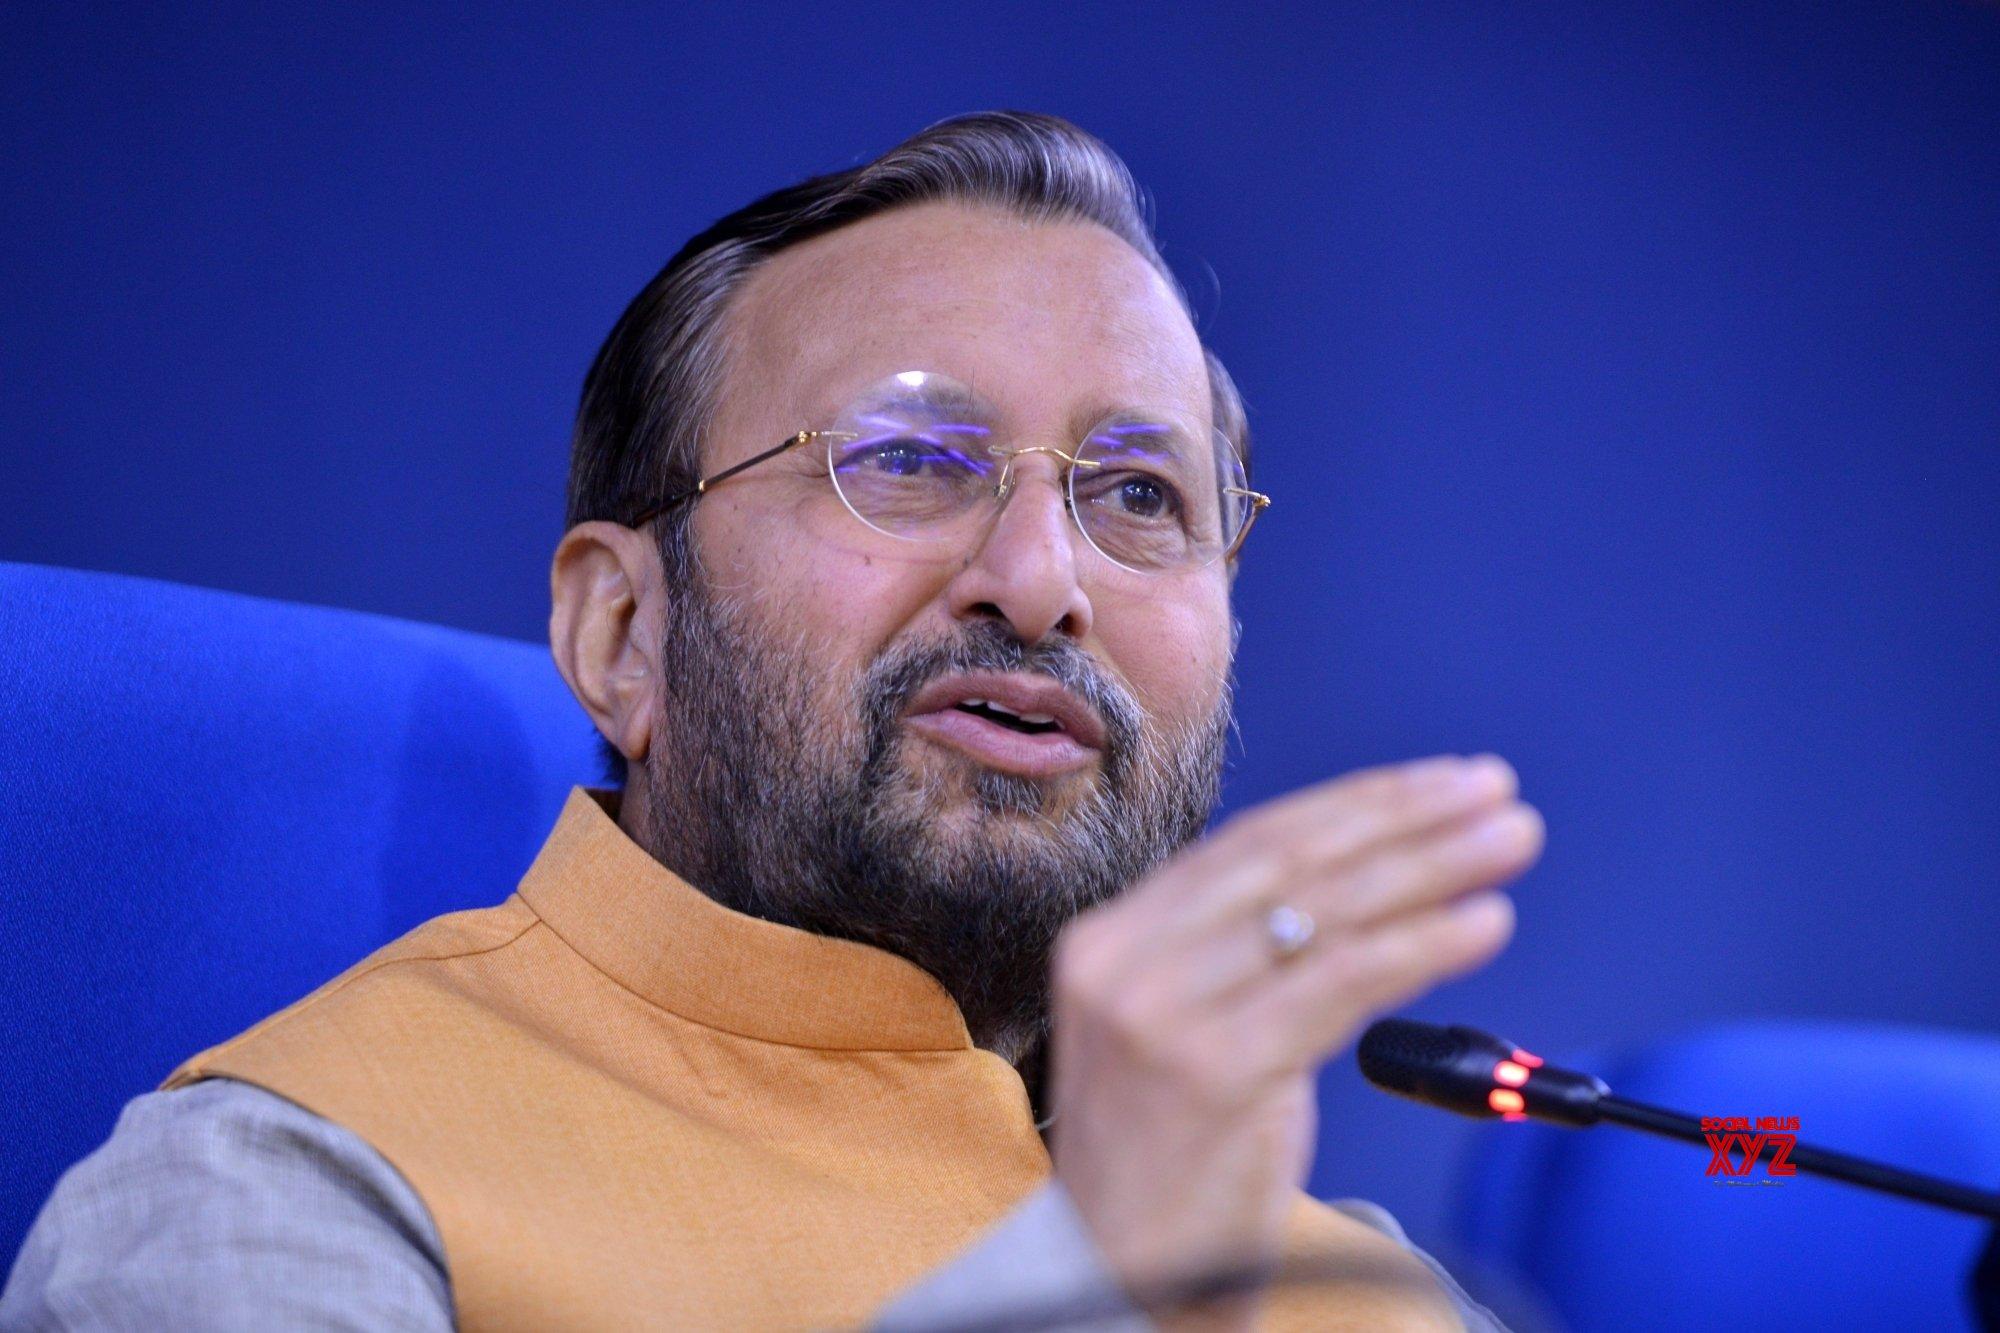 Modi's leadership has given momentum to economy: Javadekar